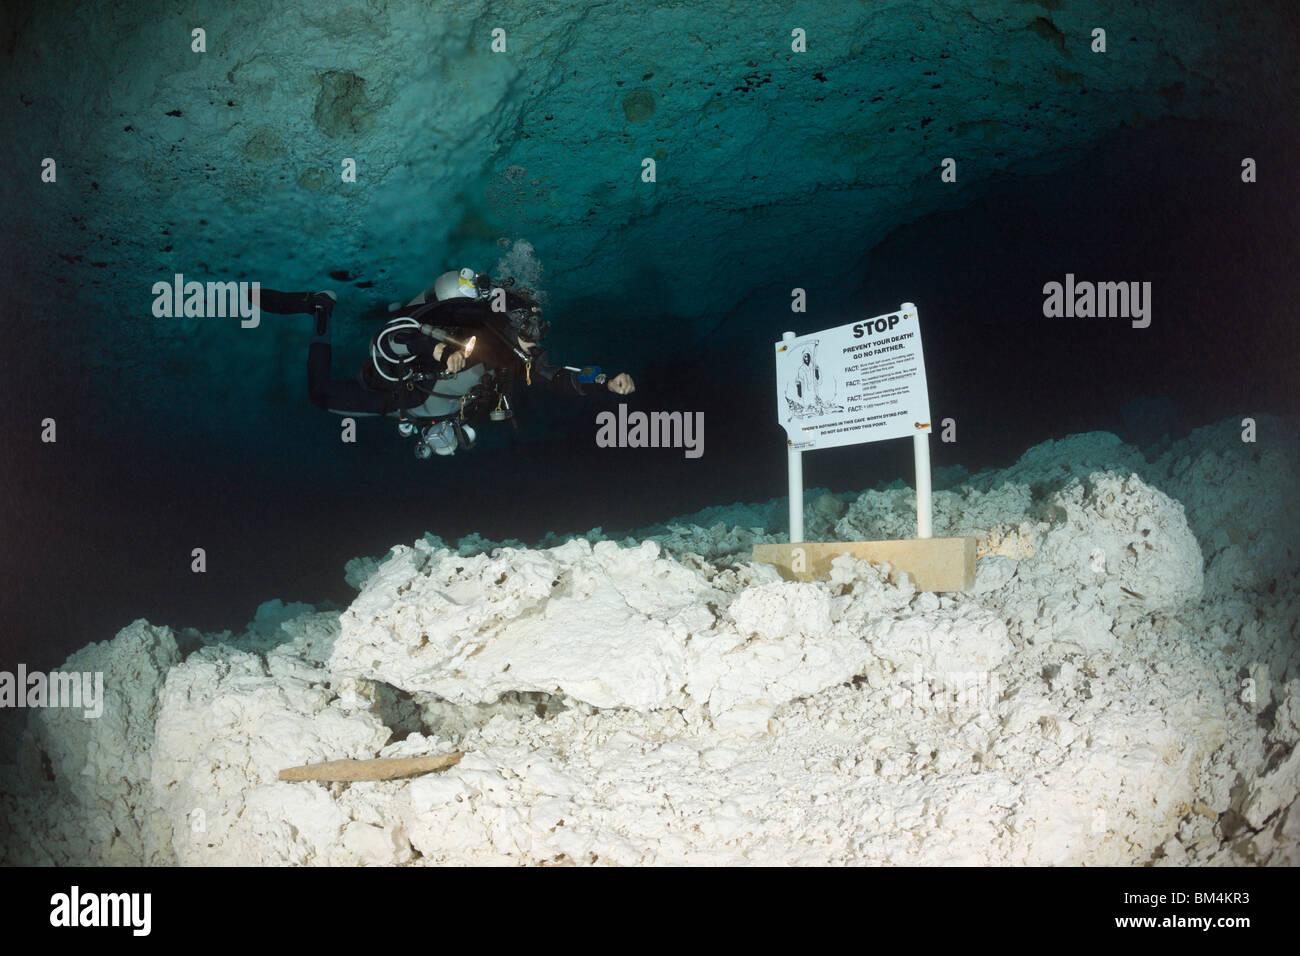 Cave Diver in Chac Mool Cenote, Playa del Carmen, Yucatan Peninsula, Mexico - Stock Image